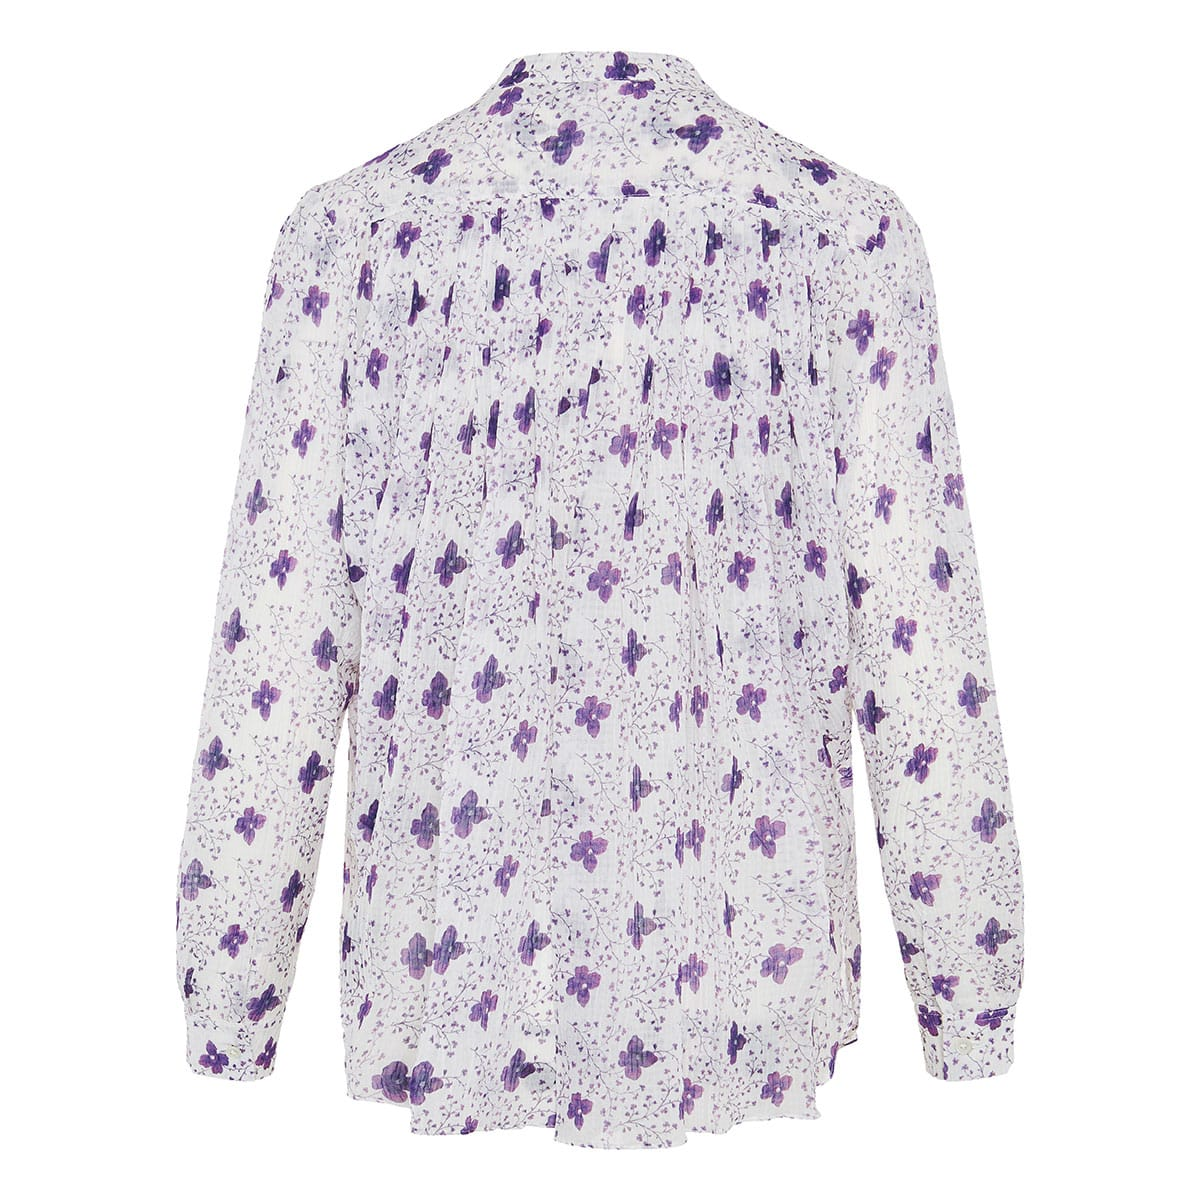 Euilali gathered floral shirt